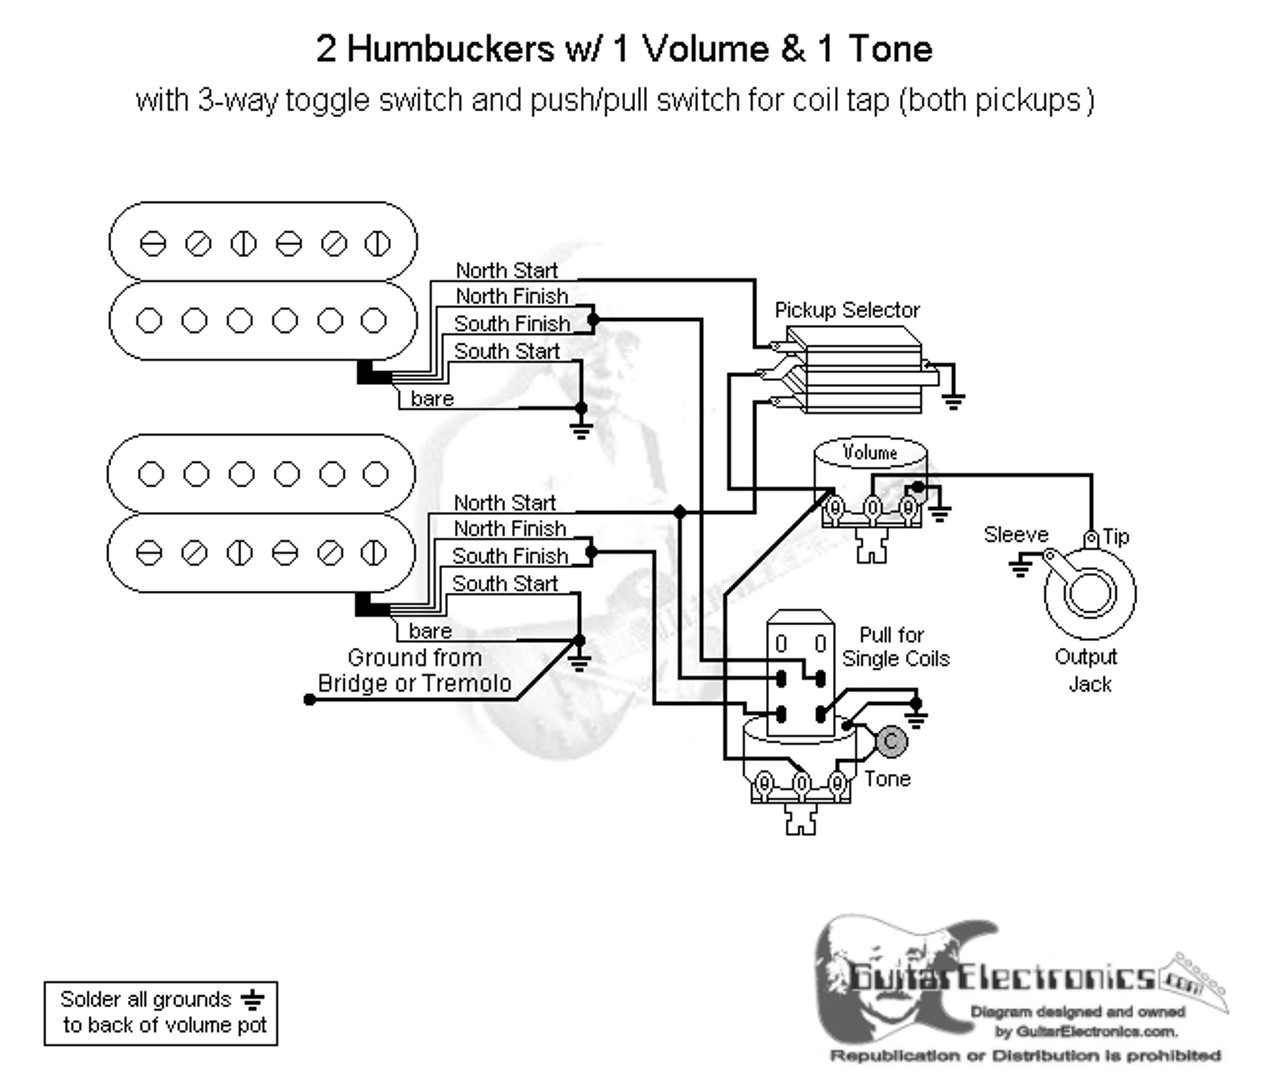 2 humbuckers 3 way toggle switch 1 volume 1 tone coil tap mix wd2hh3t11 01 45715 1470694374 jpg [ 1280 x 1083 Pixel ]